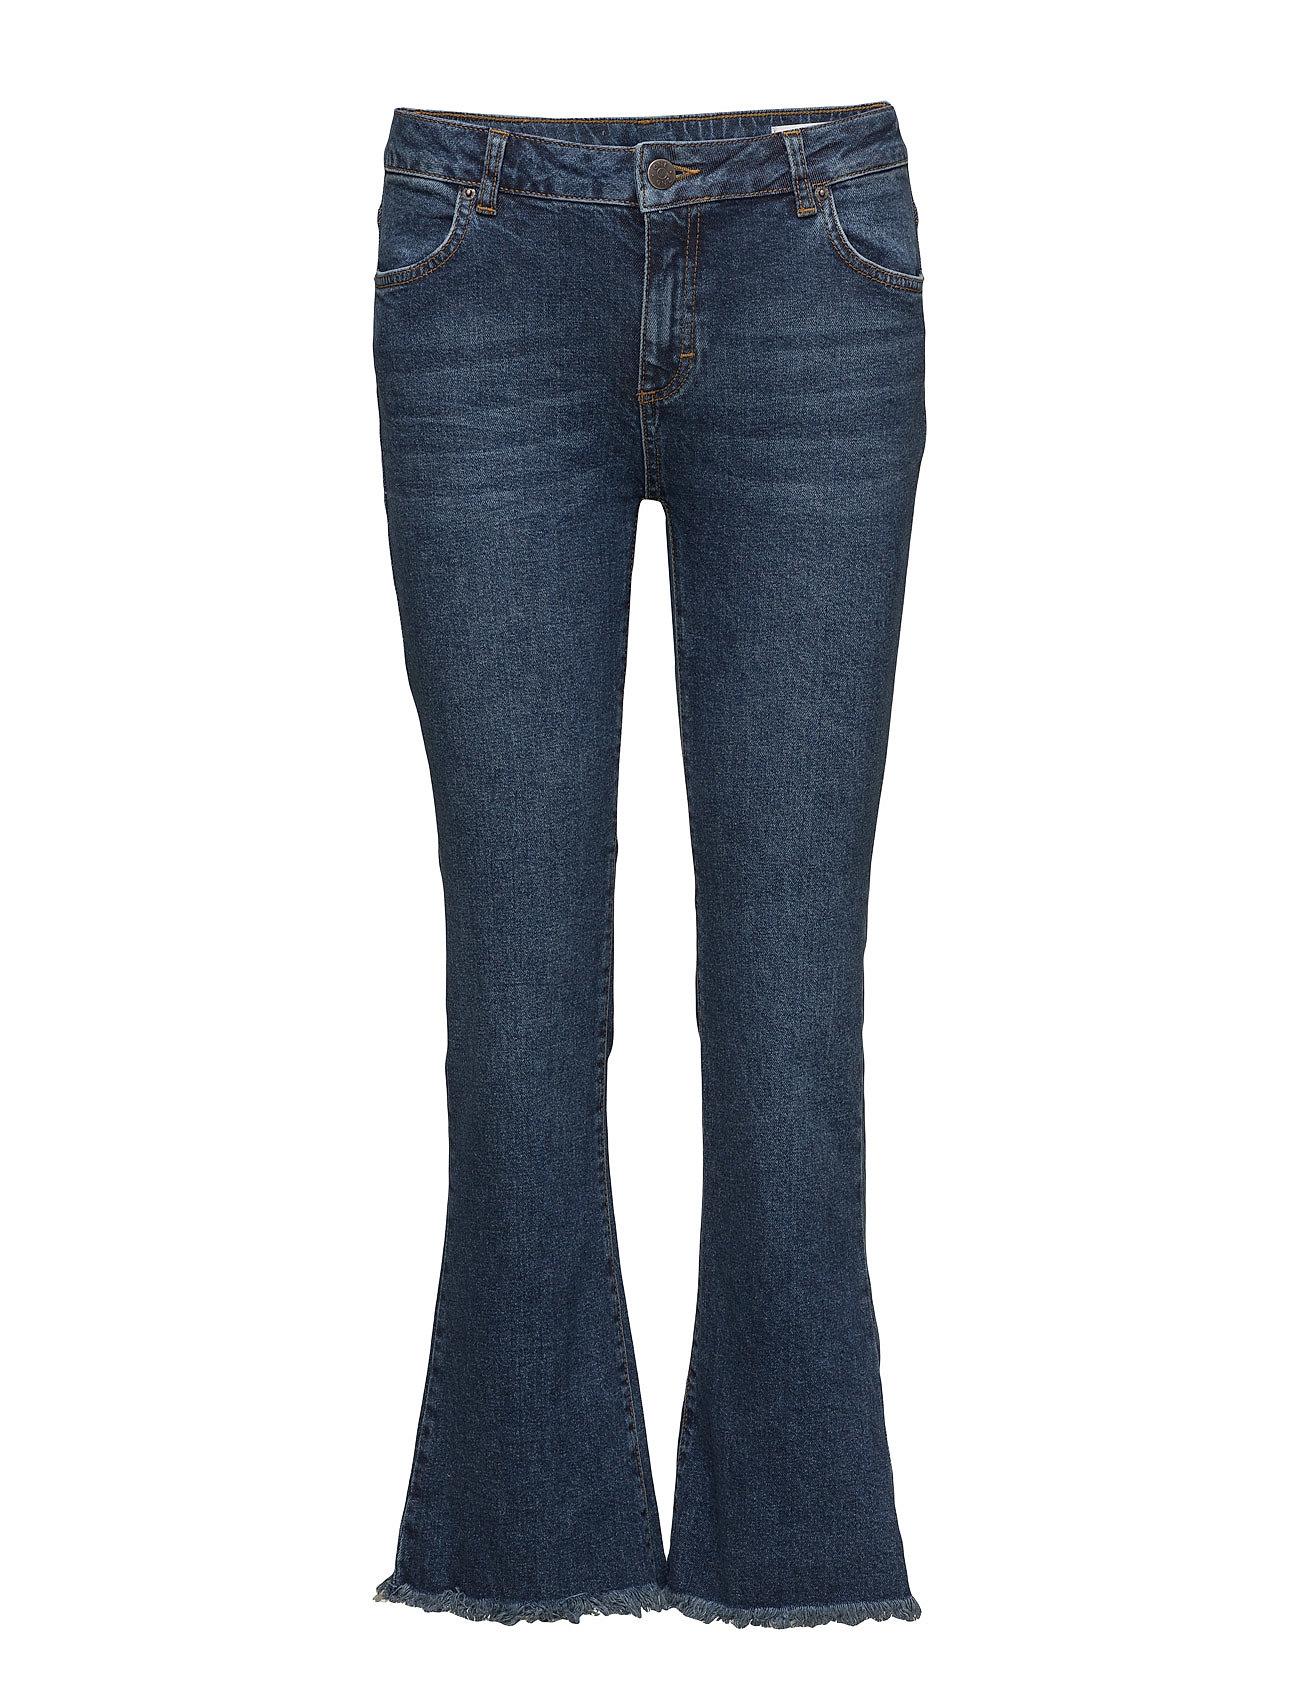 2nd One Janelle 864 Blue Mount, Jeans